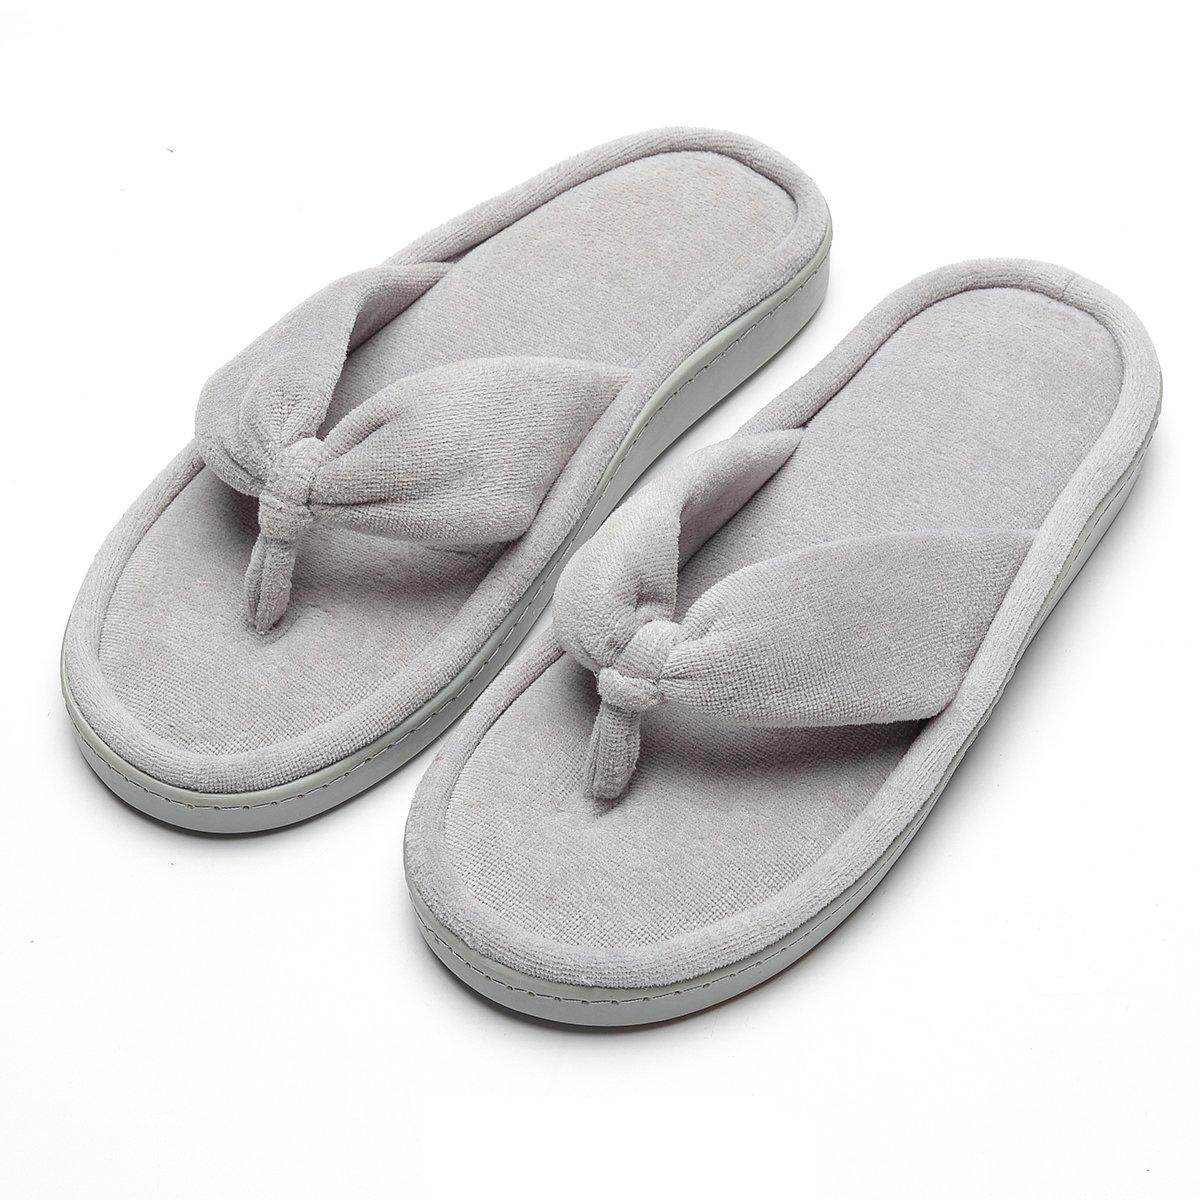 INFLATION Women's Thong Flip Flops House Indoor Slippers Fluffy Slippers Slip on Outdoor Slippers for Women